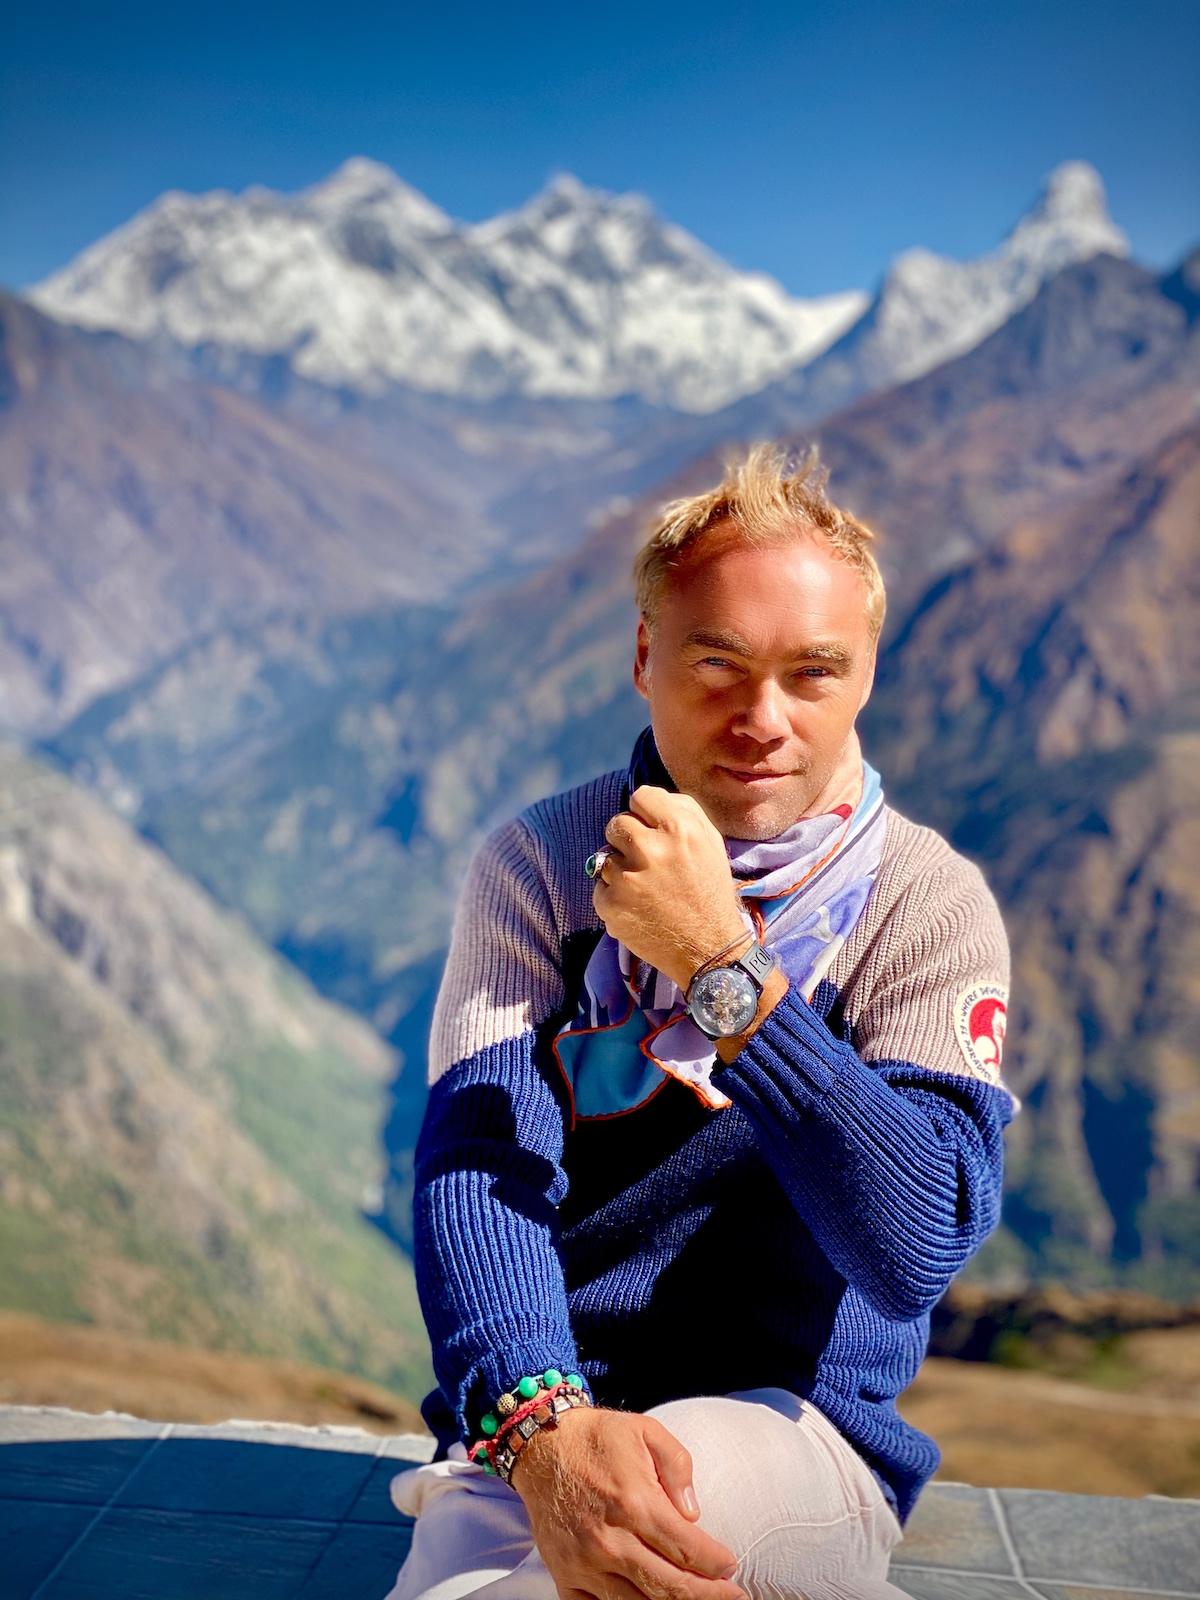 Jacob & Co. Astronomia Everest Johan Ernst Nilson